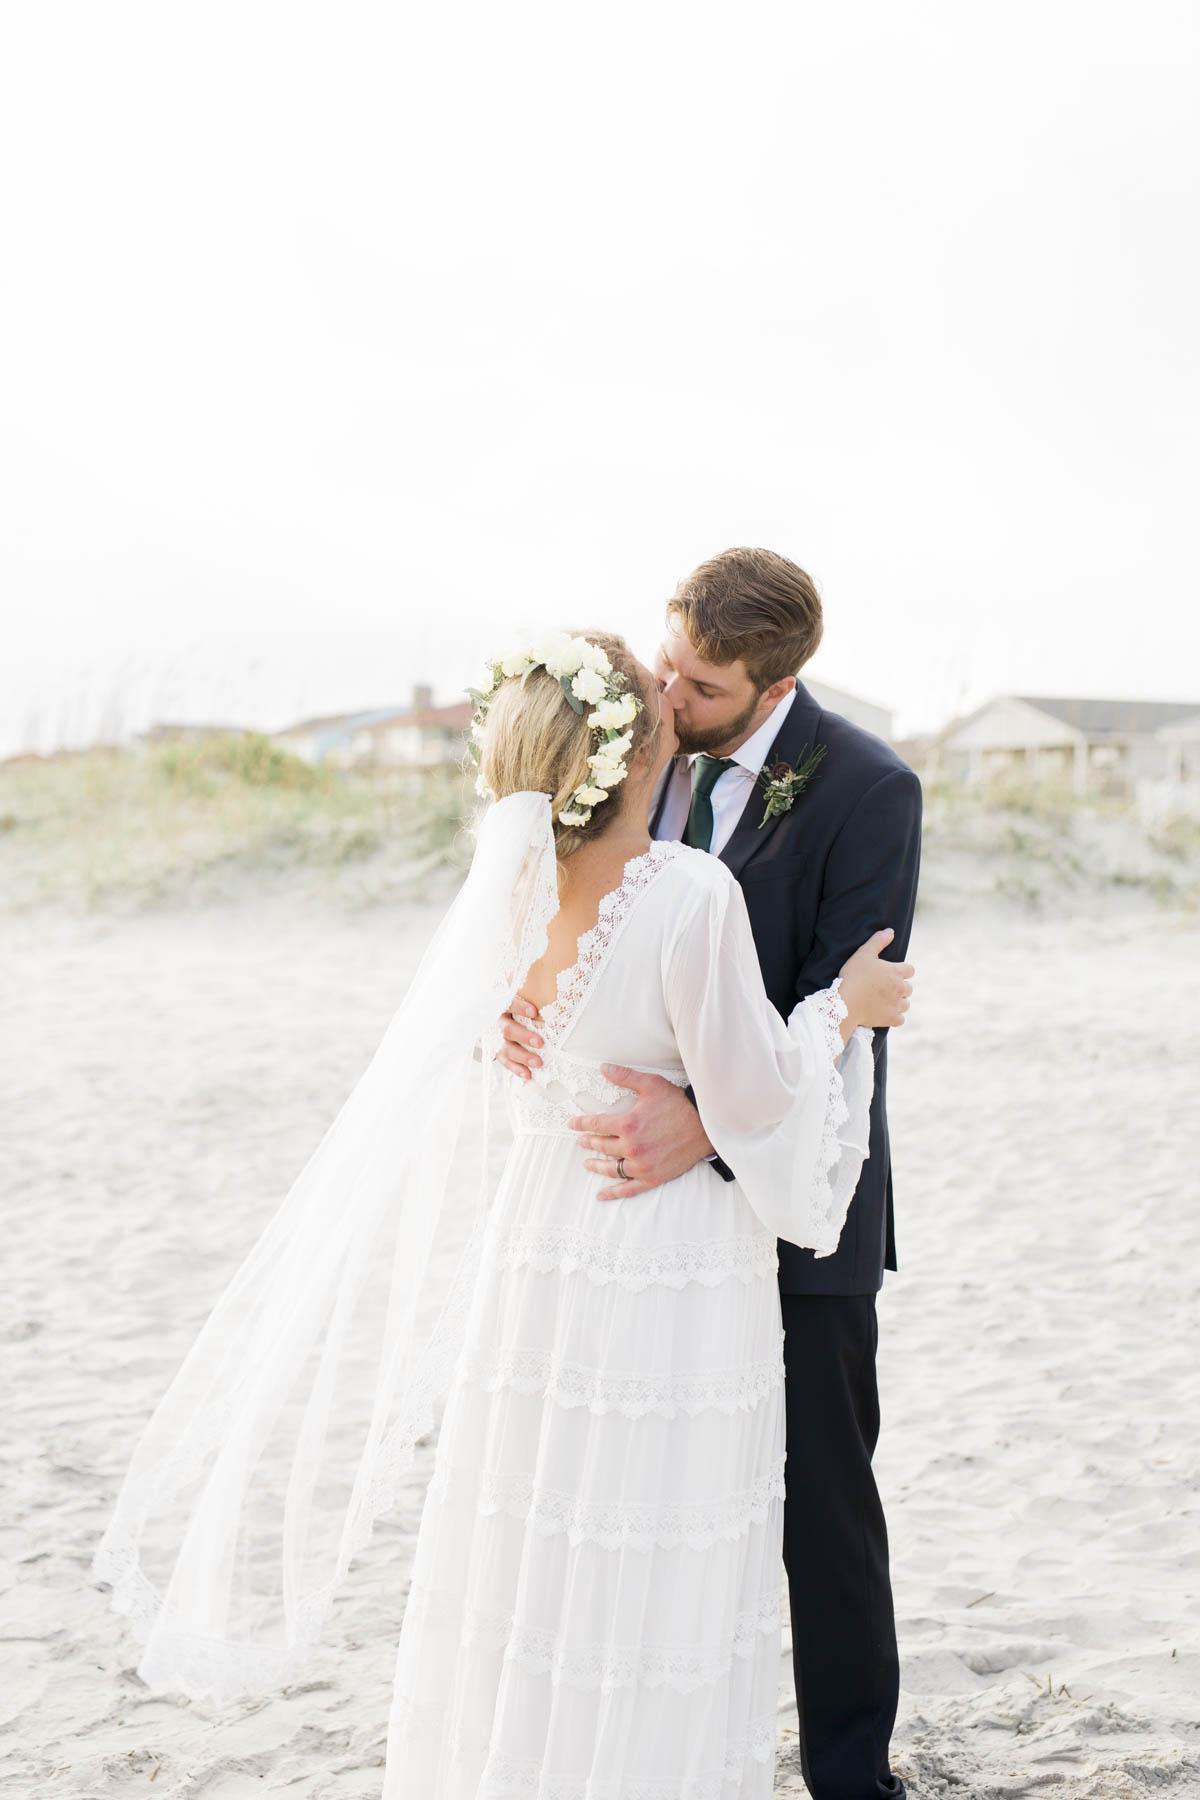 shotbychelsea_wedding_blog-43.jpg